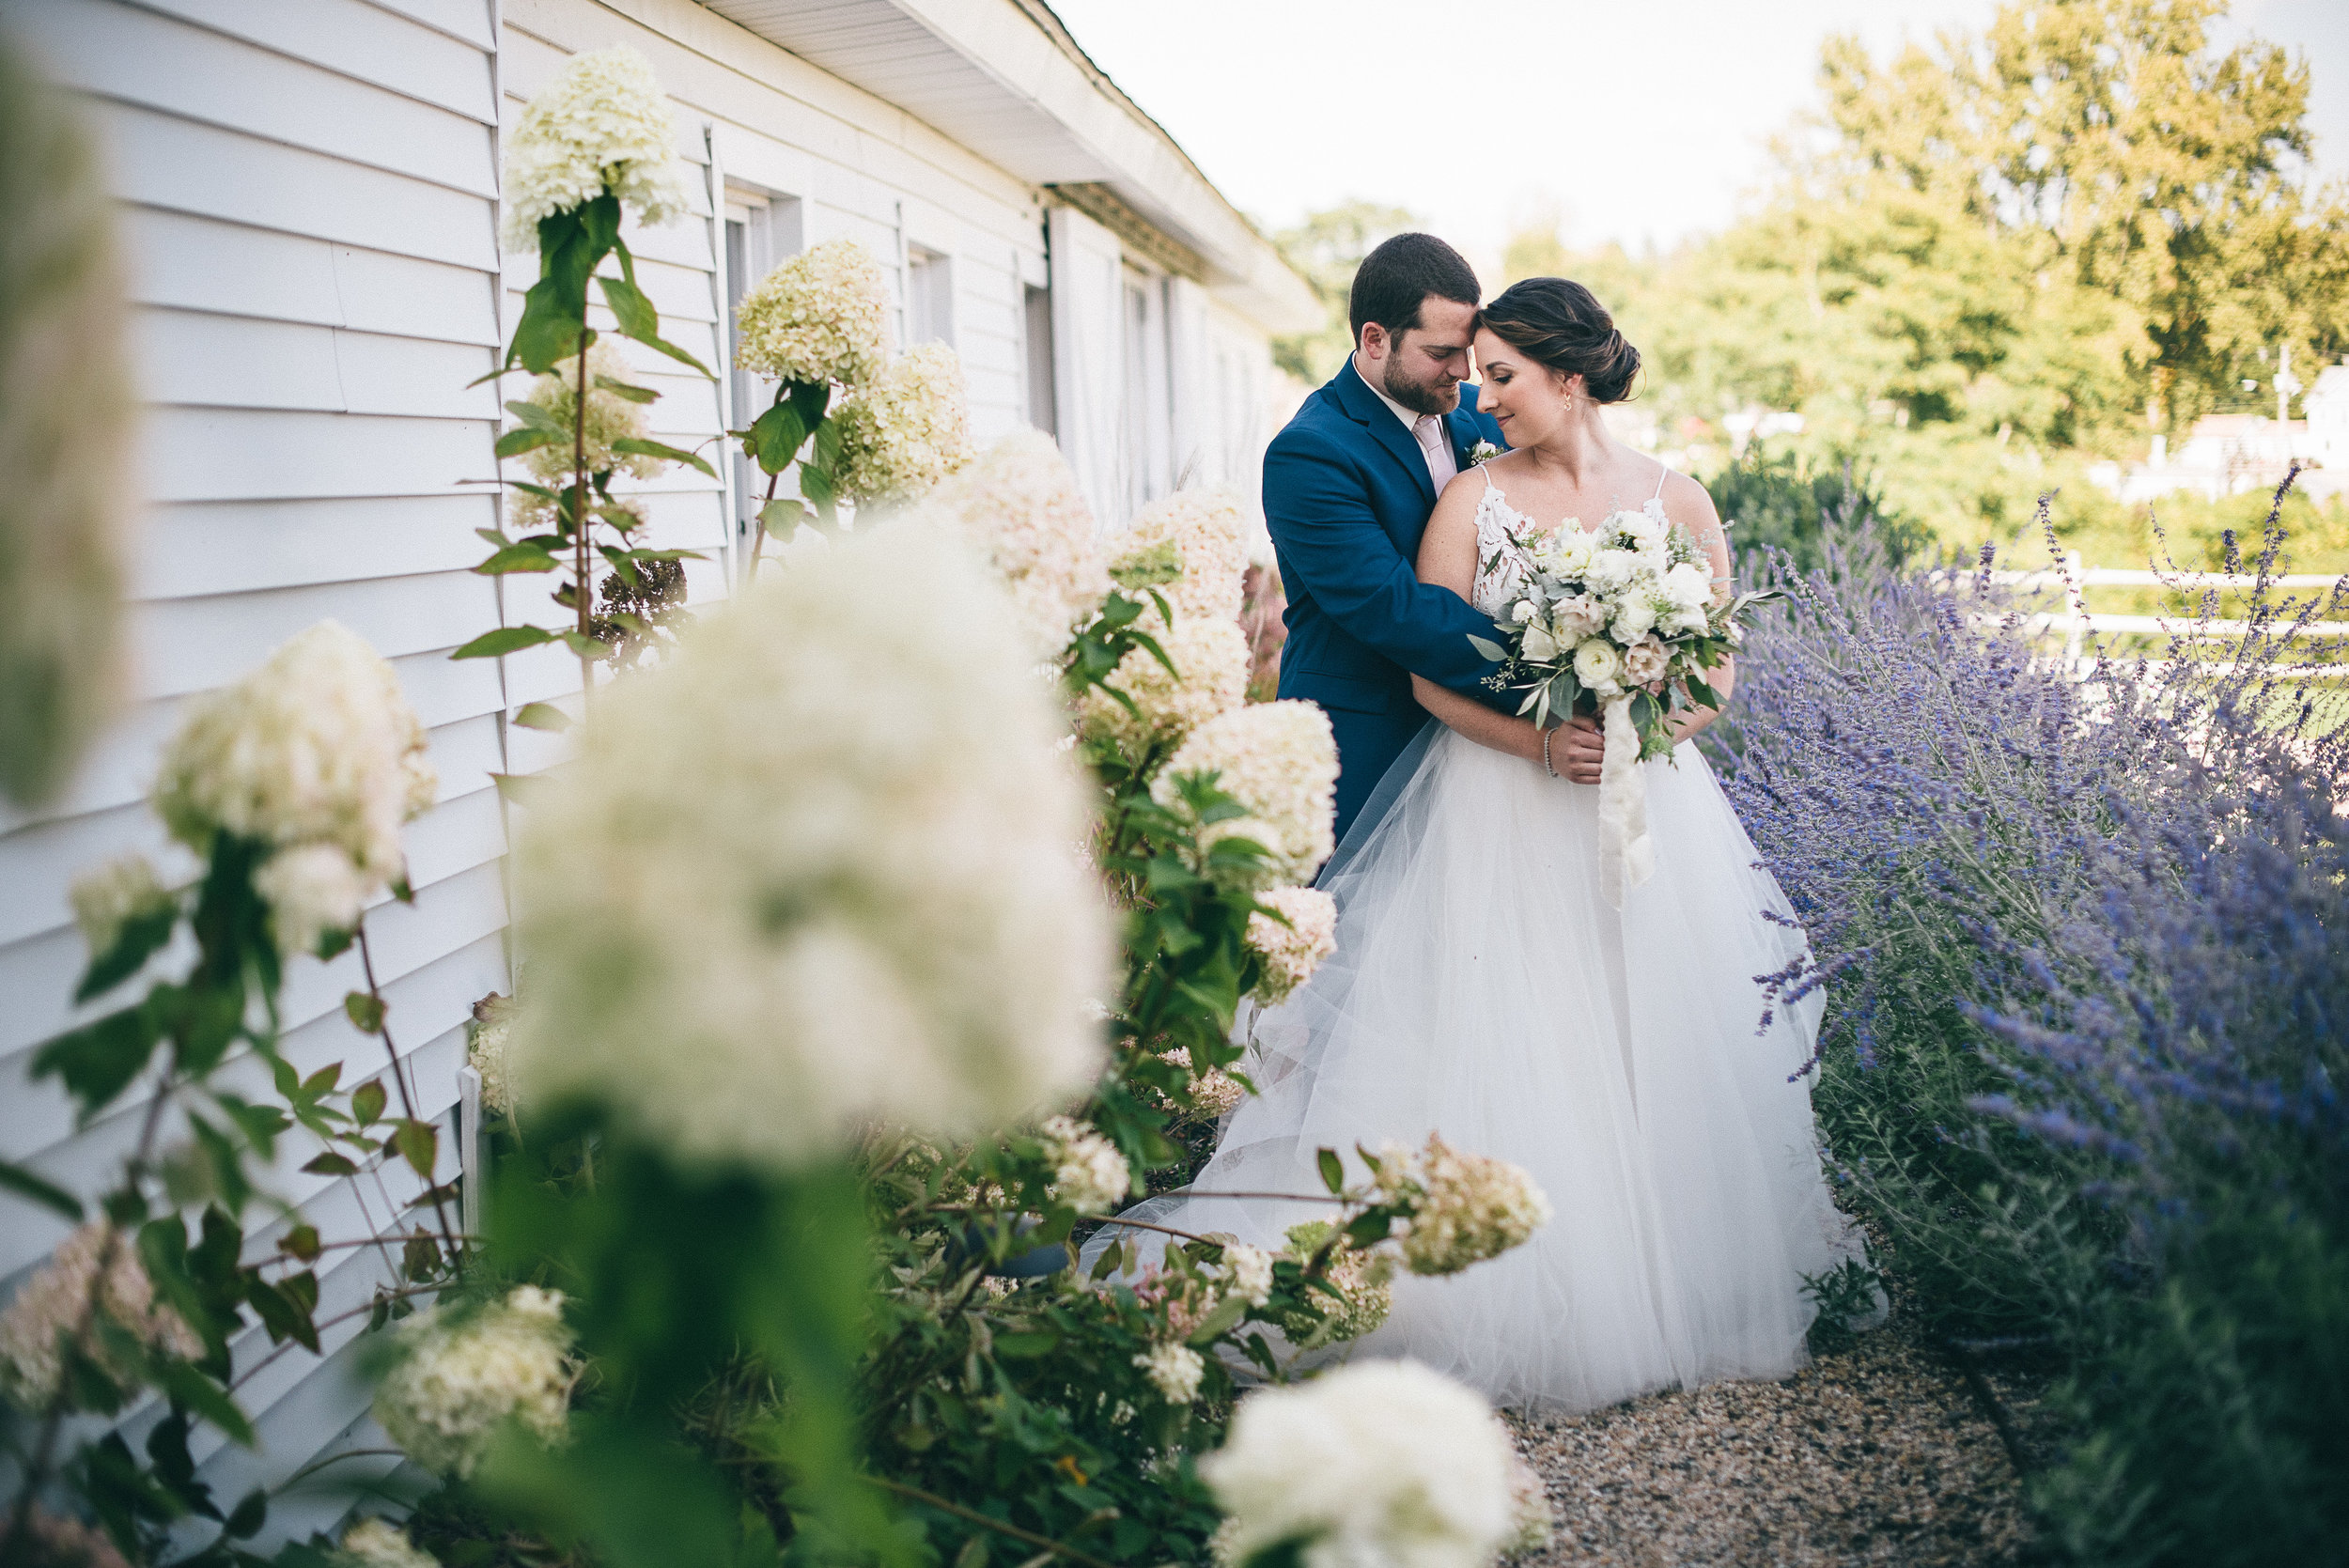 South Farms Wedding Main Line PA Wedding Planner_1-2.JPG